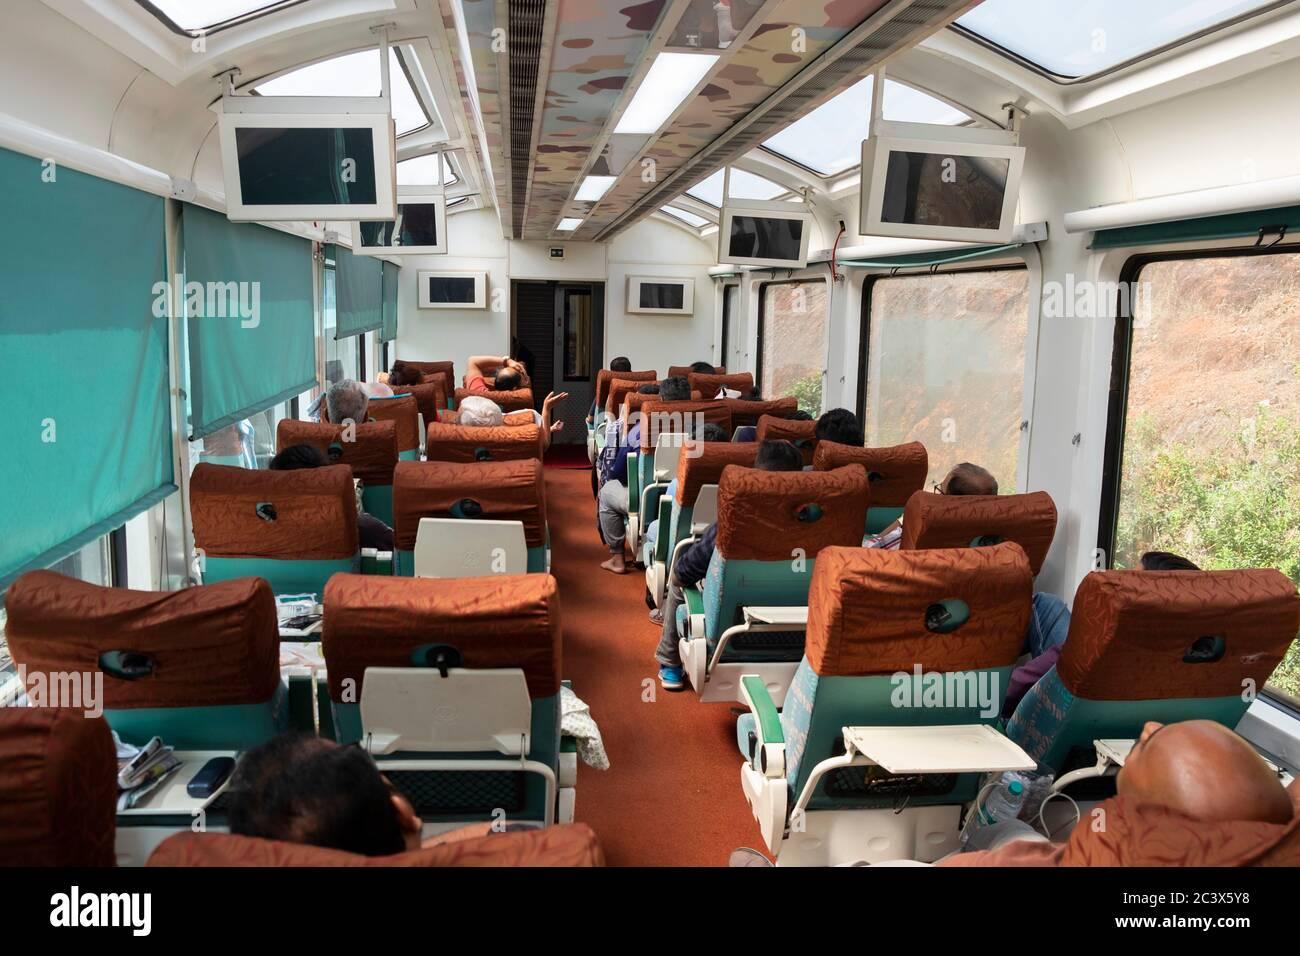 Passengers inside the modern TEJAS EXPRESS train to Goa, India. Stock Photo